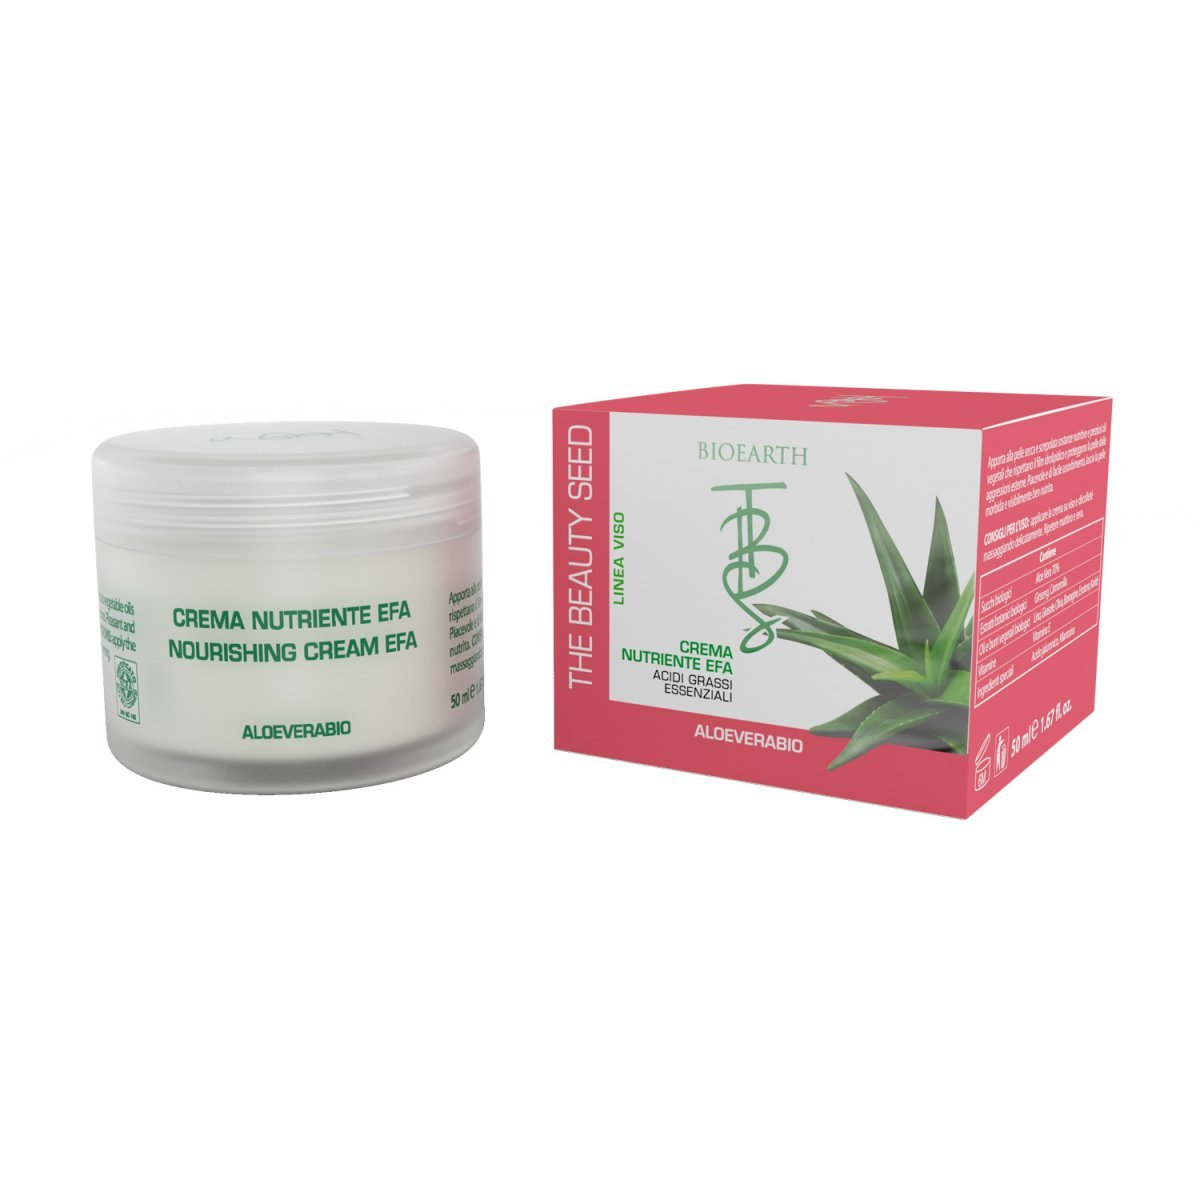 The Beauty Seed Nourishing cream Efa with Aloe